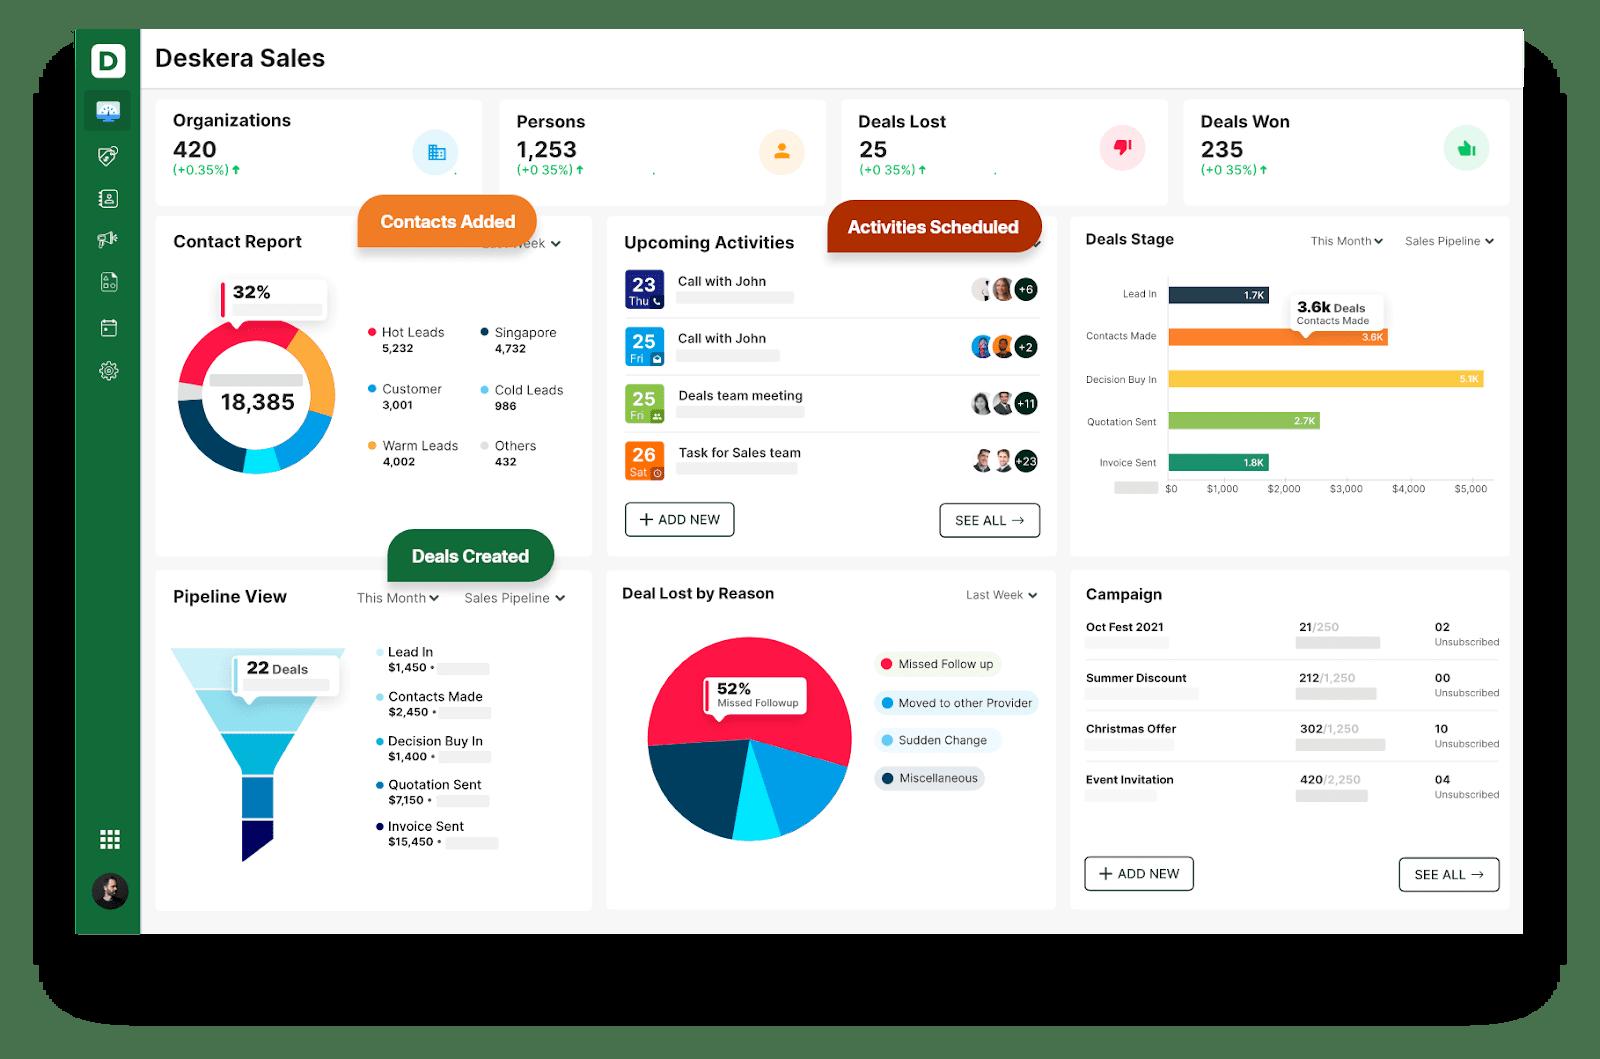 Deskera Sales Dashboard - What is Sales?